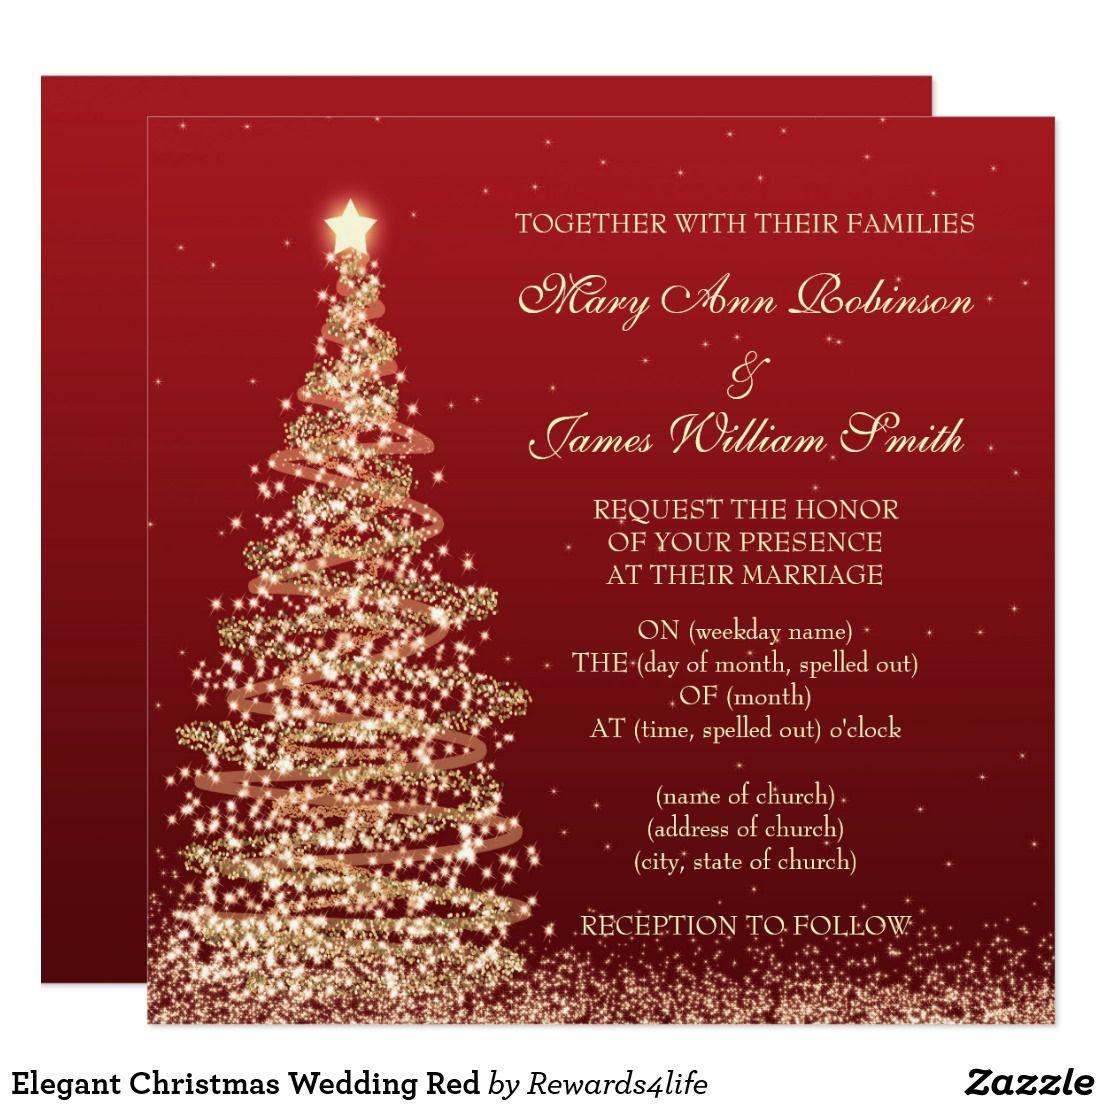 Elegant Christmas Wedding Red Card | Holidays, Celebrations, Events ...